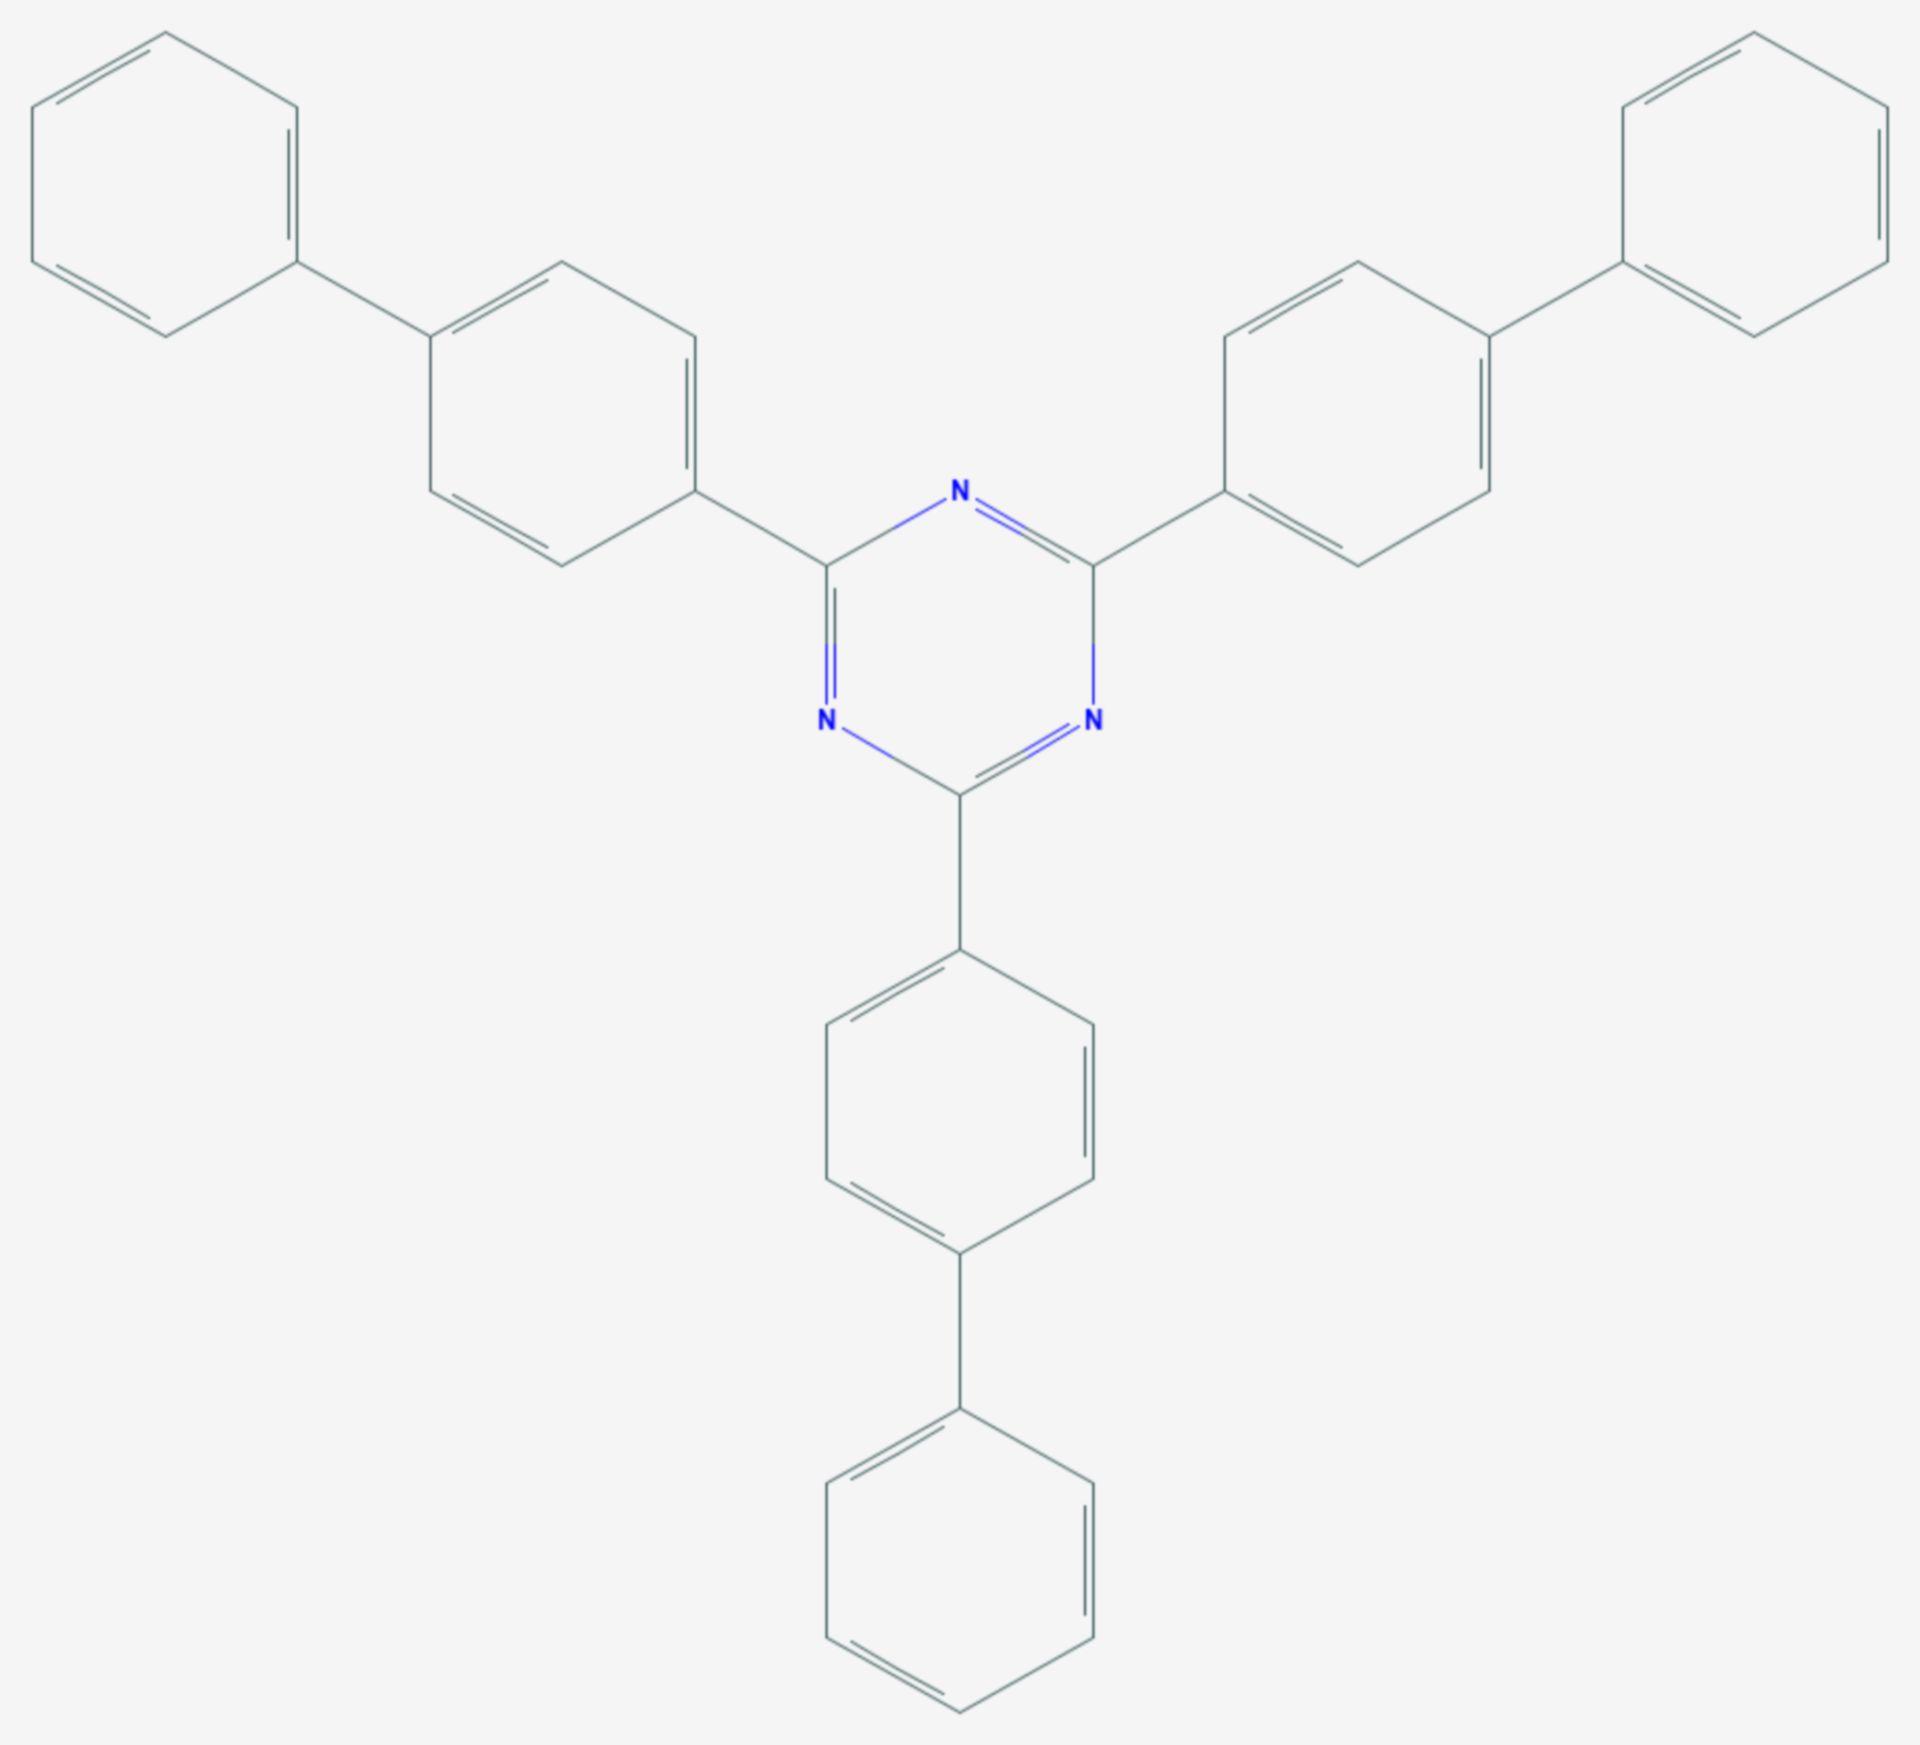 2,4,6-Tris(biphenyl-4-yl)-1,3,5-triazin (Strukturformel)